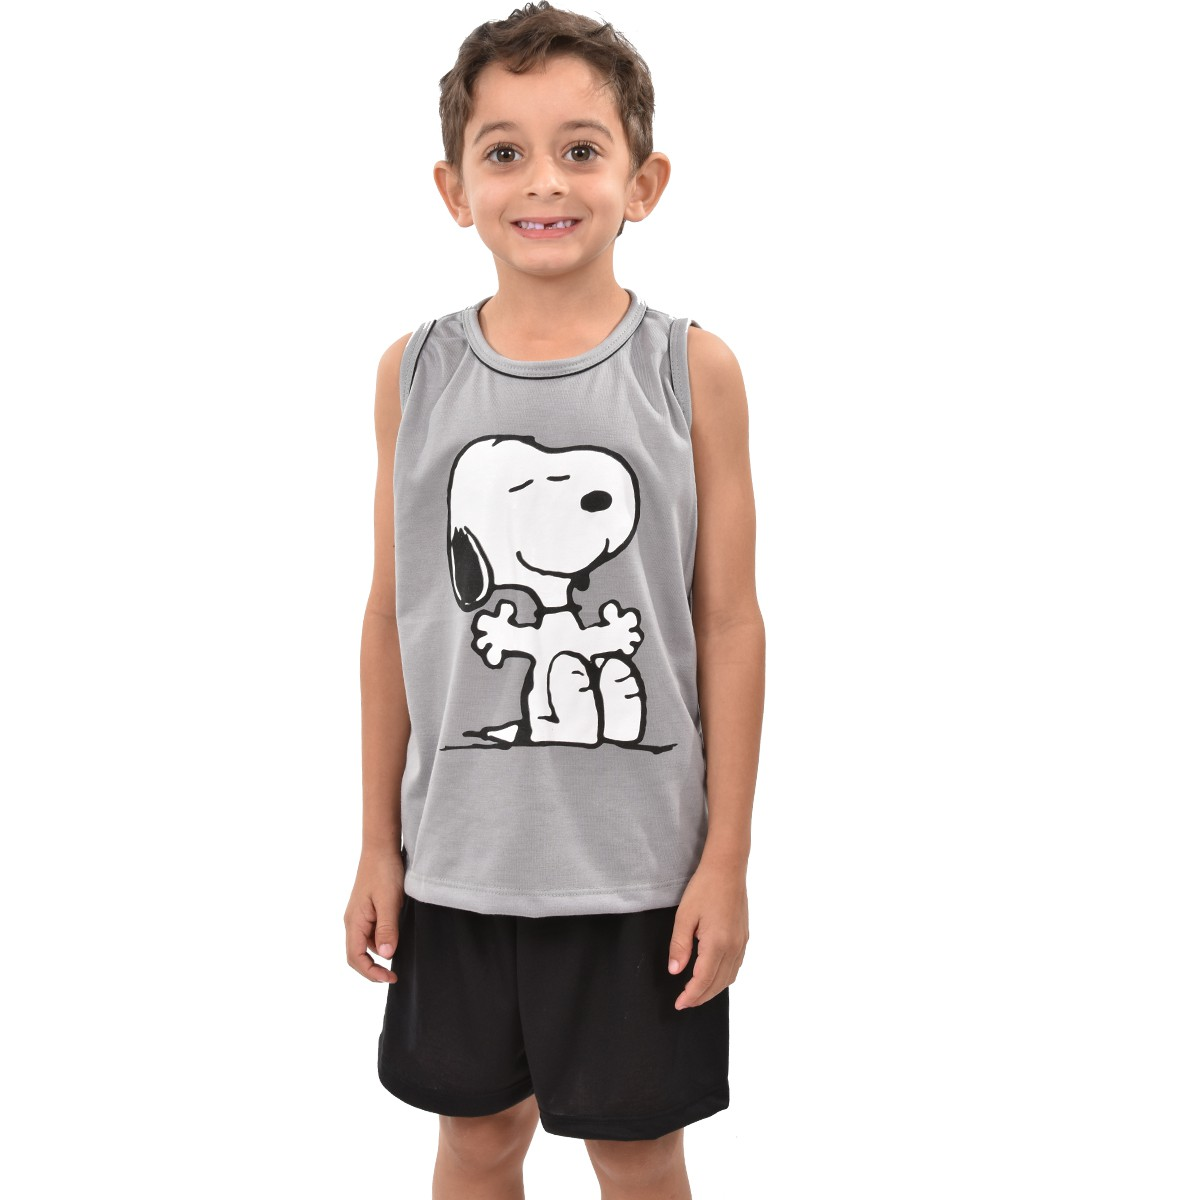 Pijama Regata Short Snoopy Masculino Infantil Menino Ref: 327